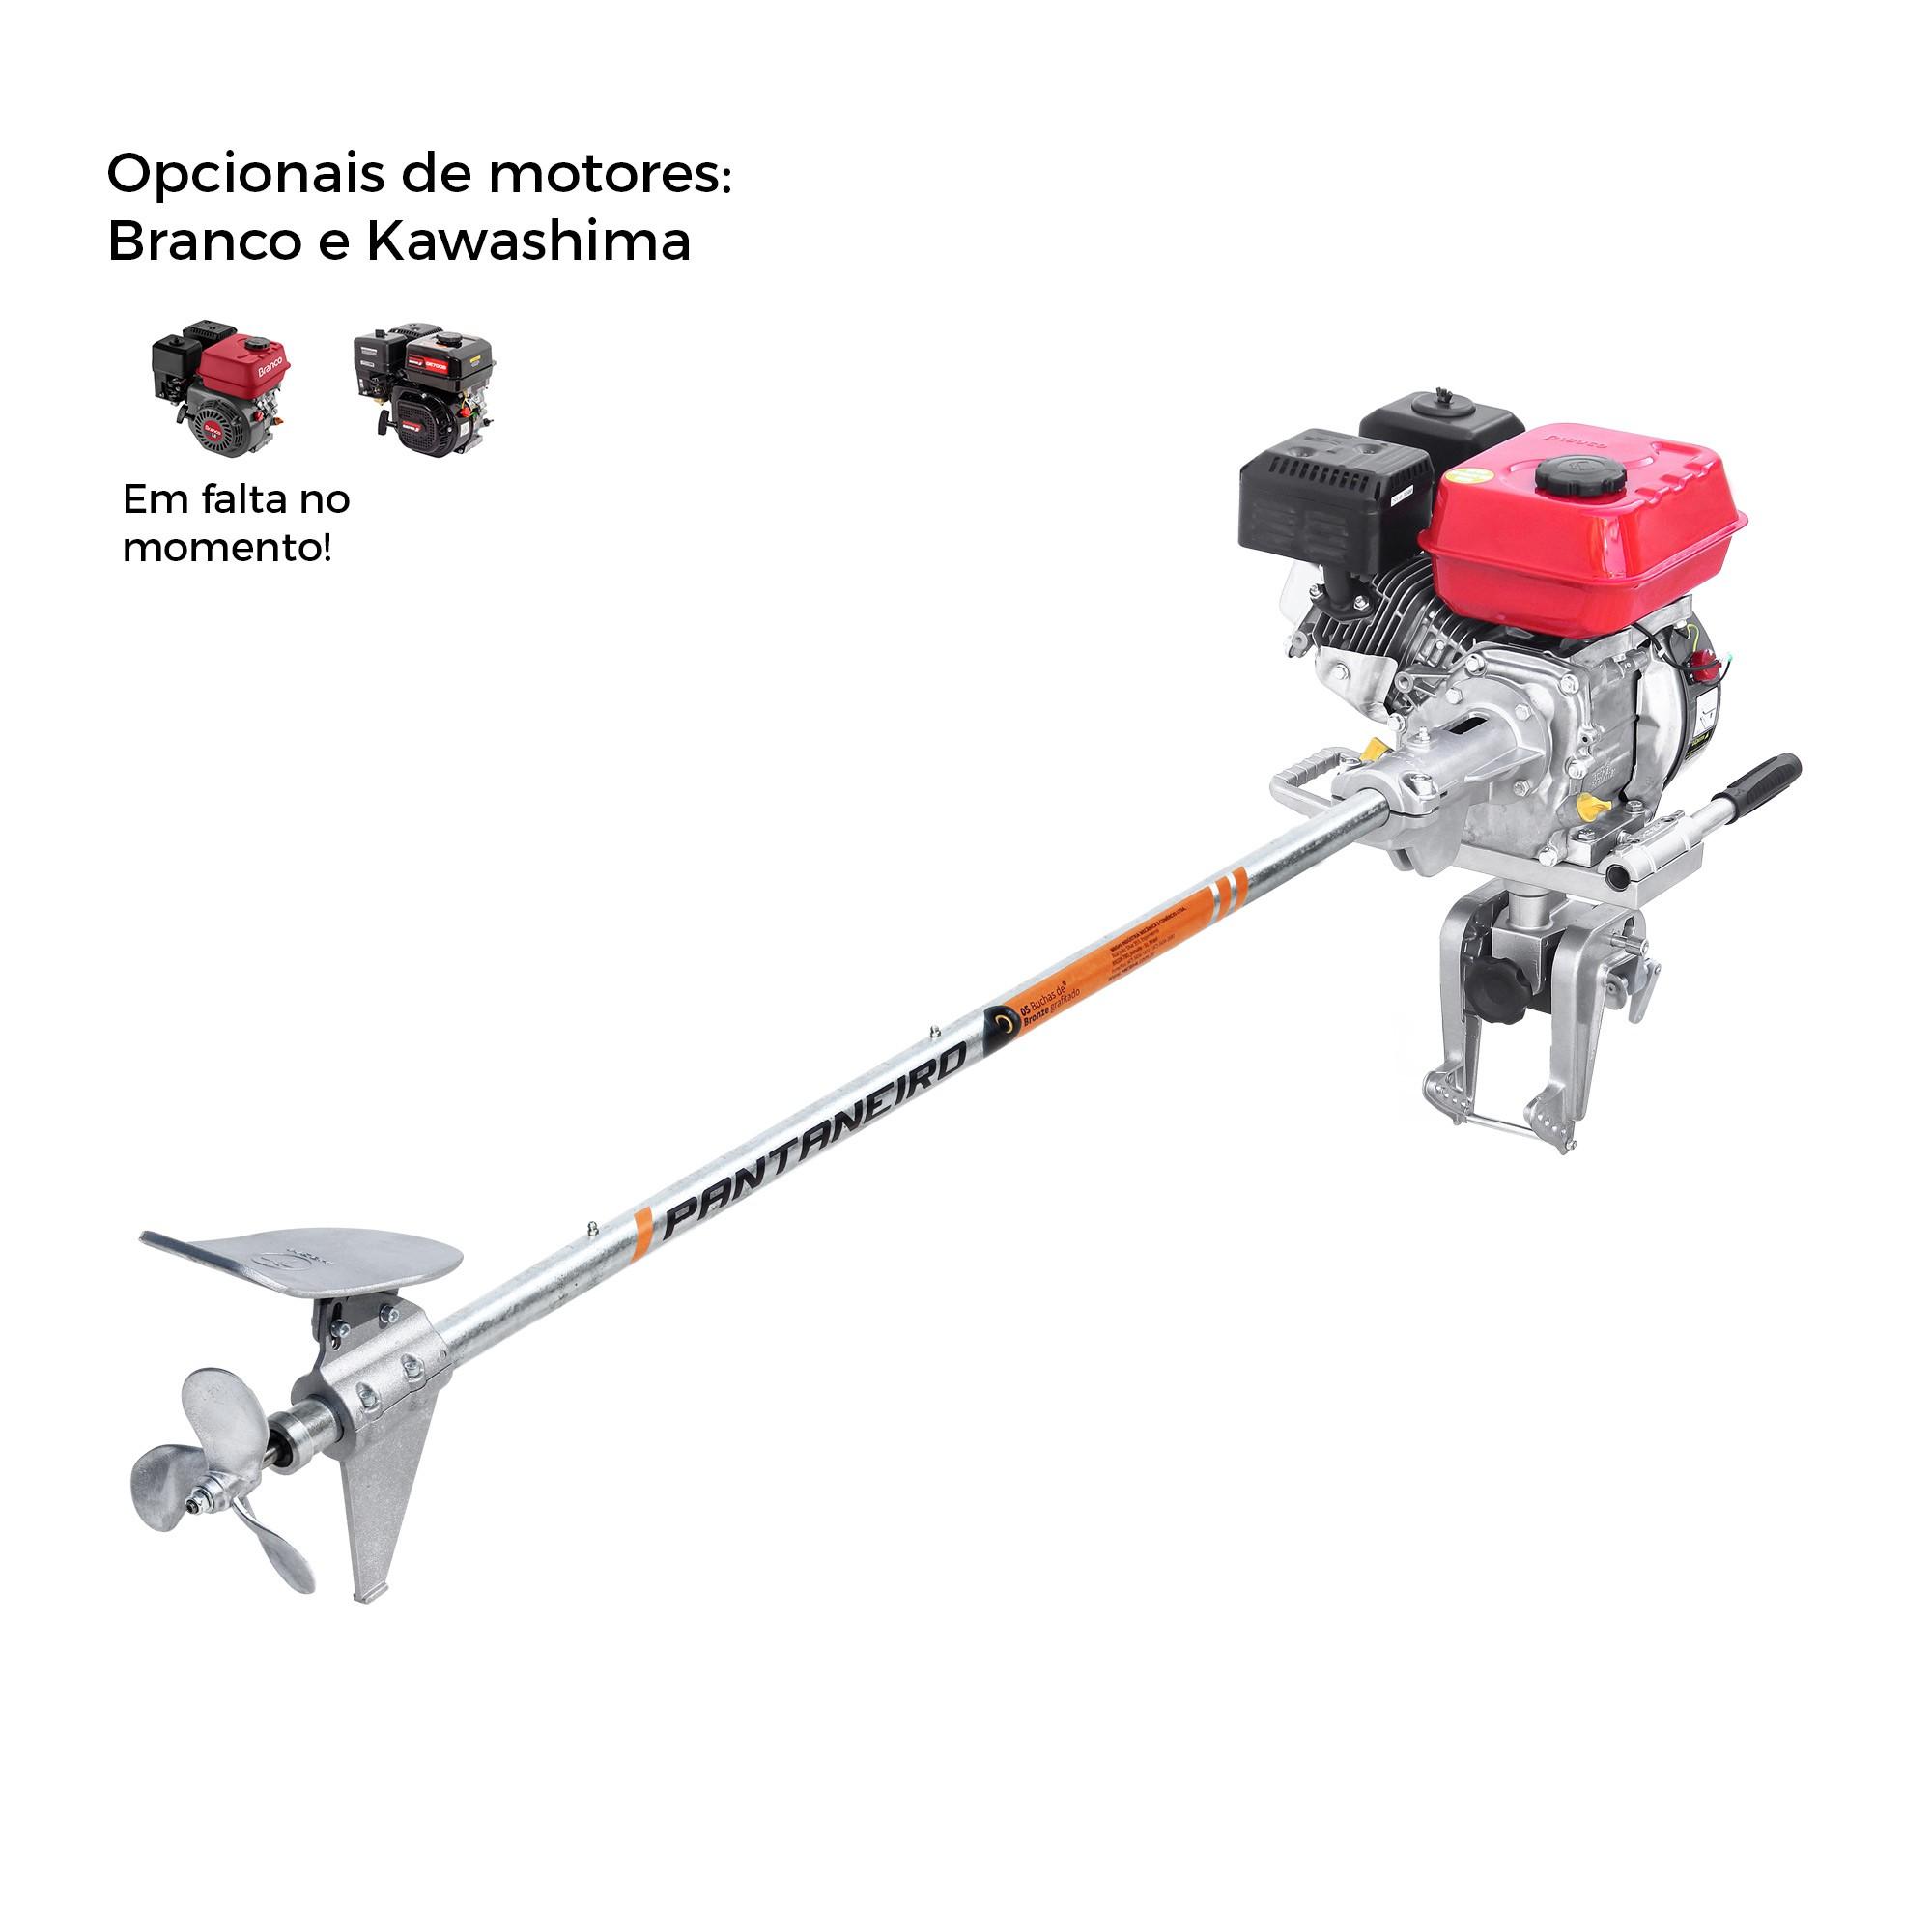 Rabeta Master Plus Pantaneiro 1,70m com Motor BRANCO 4T 7.0 HP Gasolina / Partida Manual